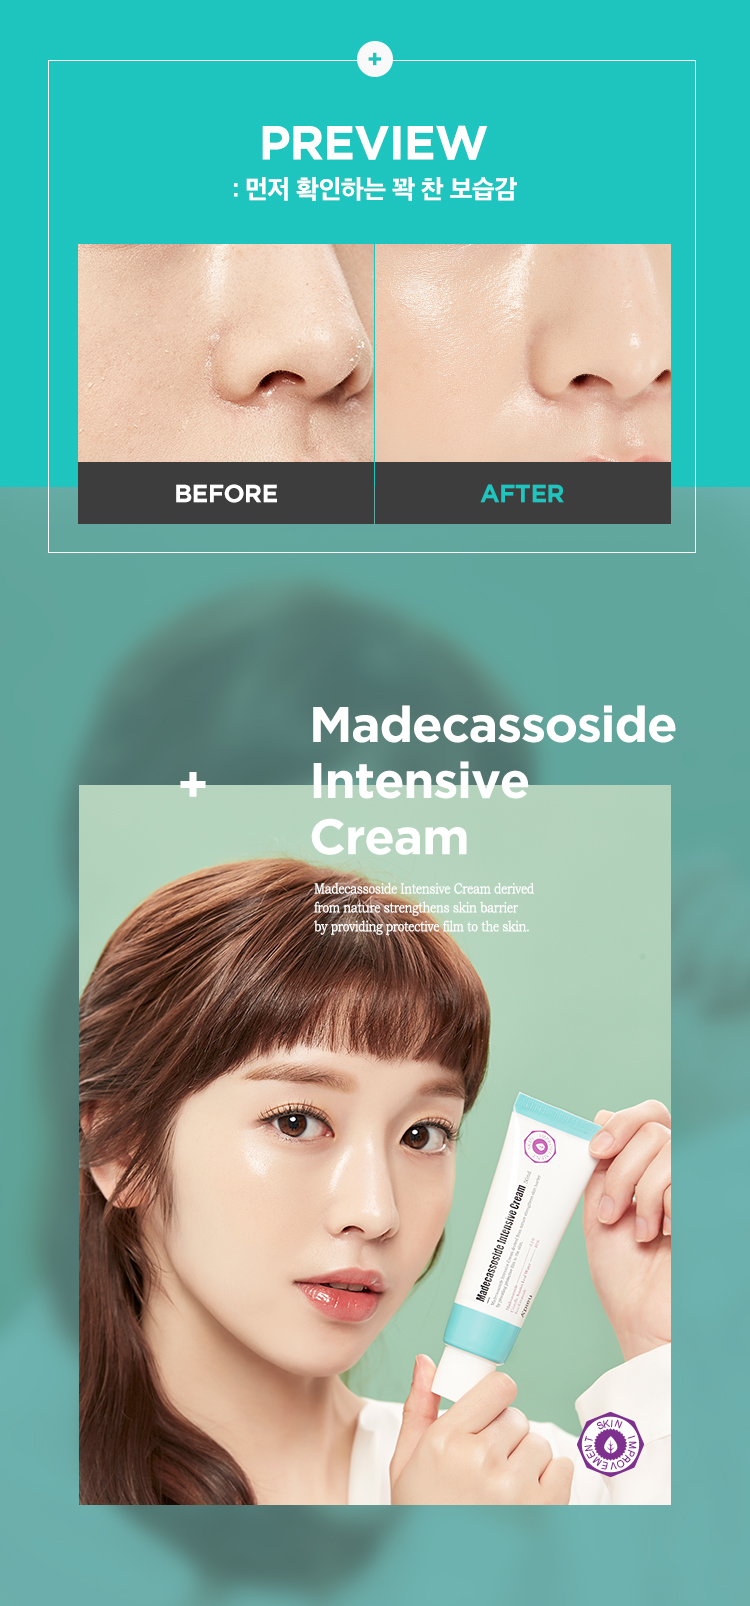 APIEU_Madecassoside_IntensiveCream_02.jpg